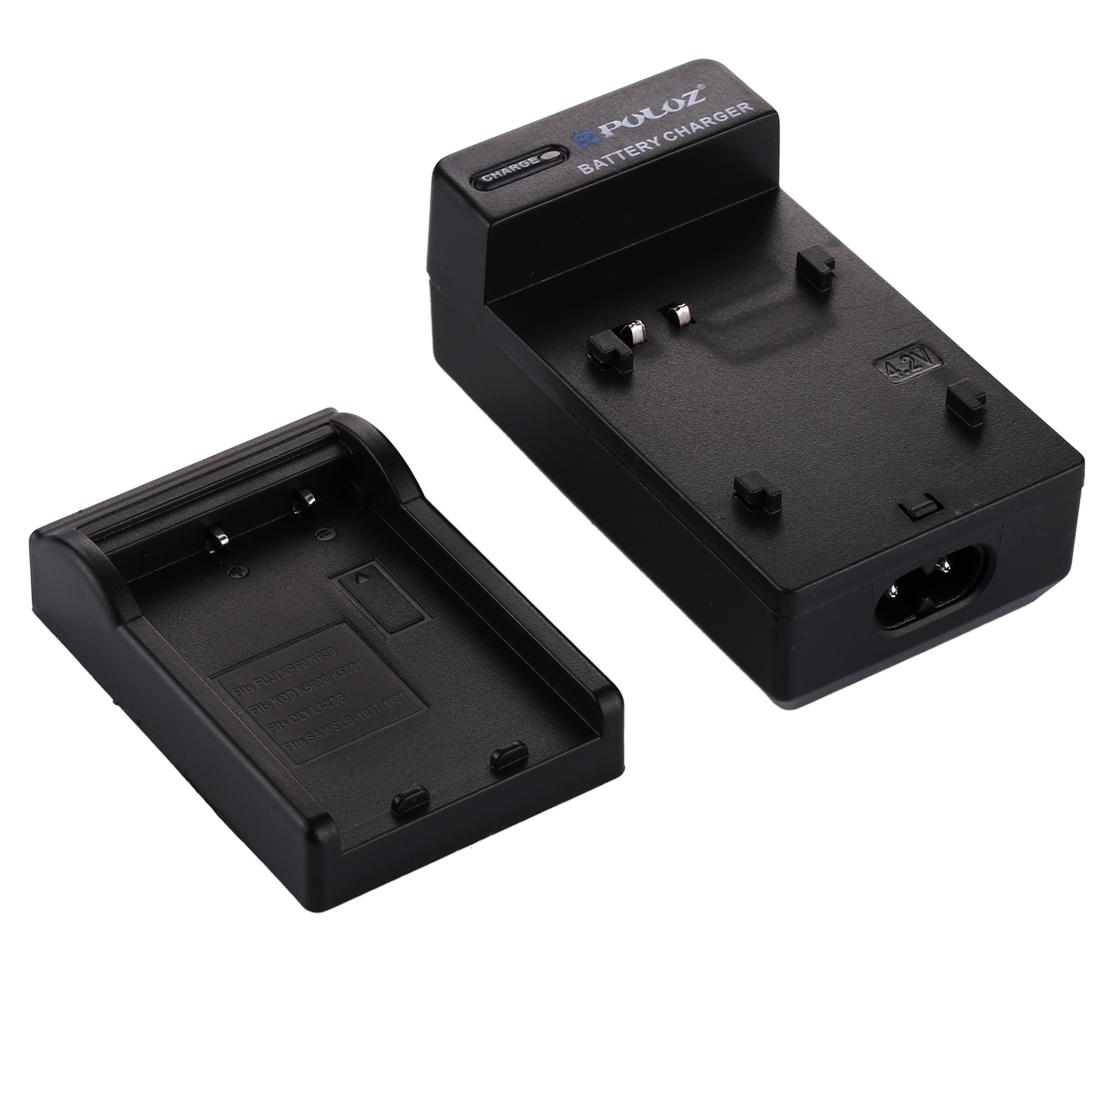 PULUZ 2 in 1 Digital Camera Battery Car Charger for Fujifilm NP-60 / NP-30, Kodak K5000 / K5001, Olympus LI-20B, Samsung SLB-1037 / 1137 Battery